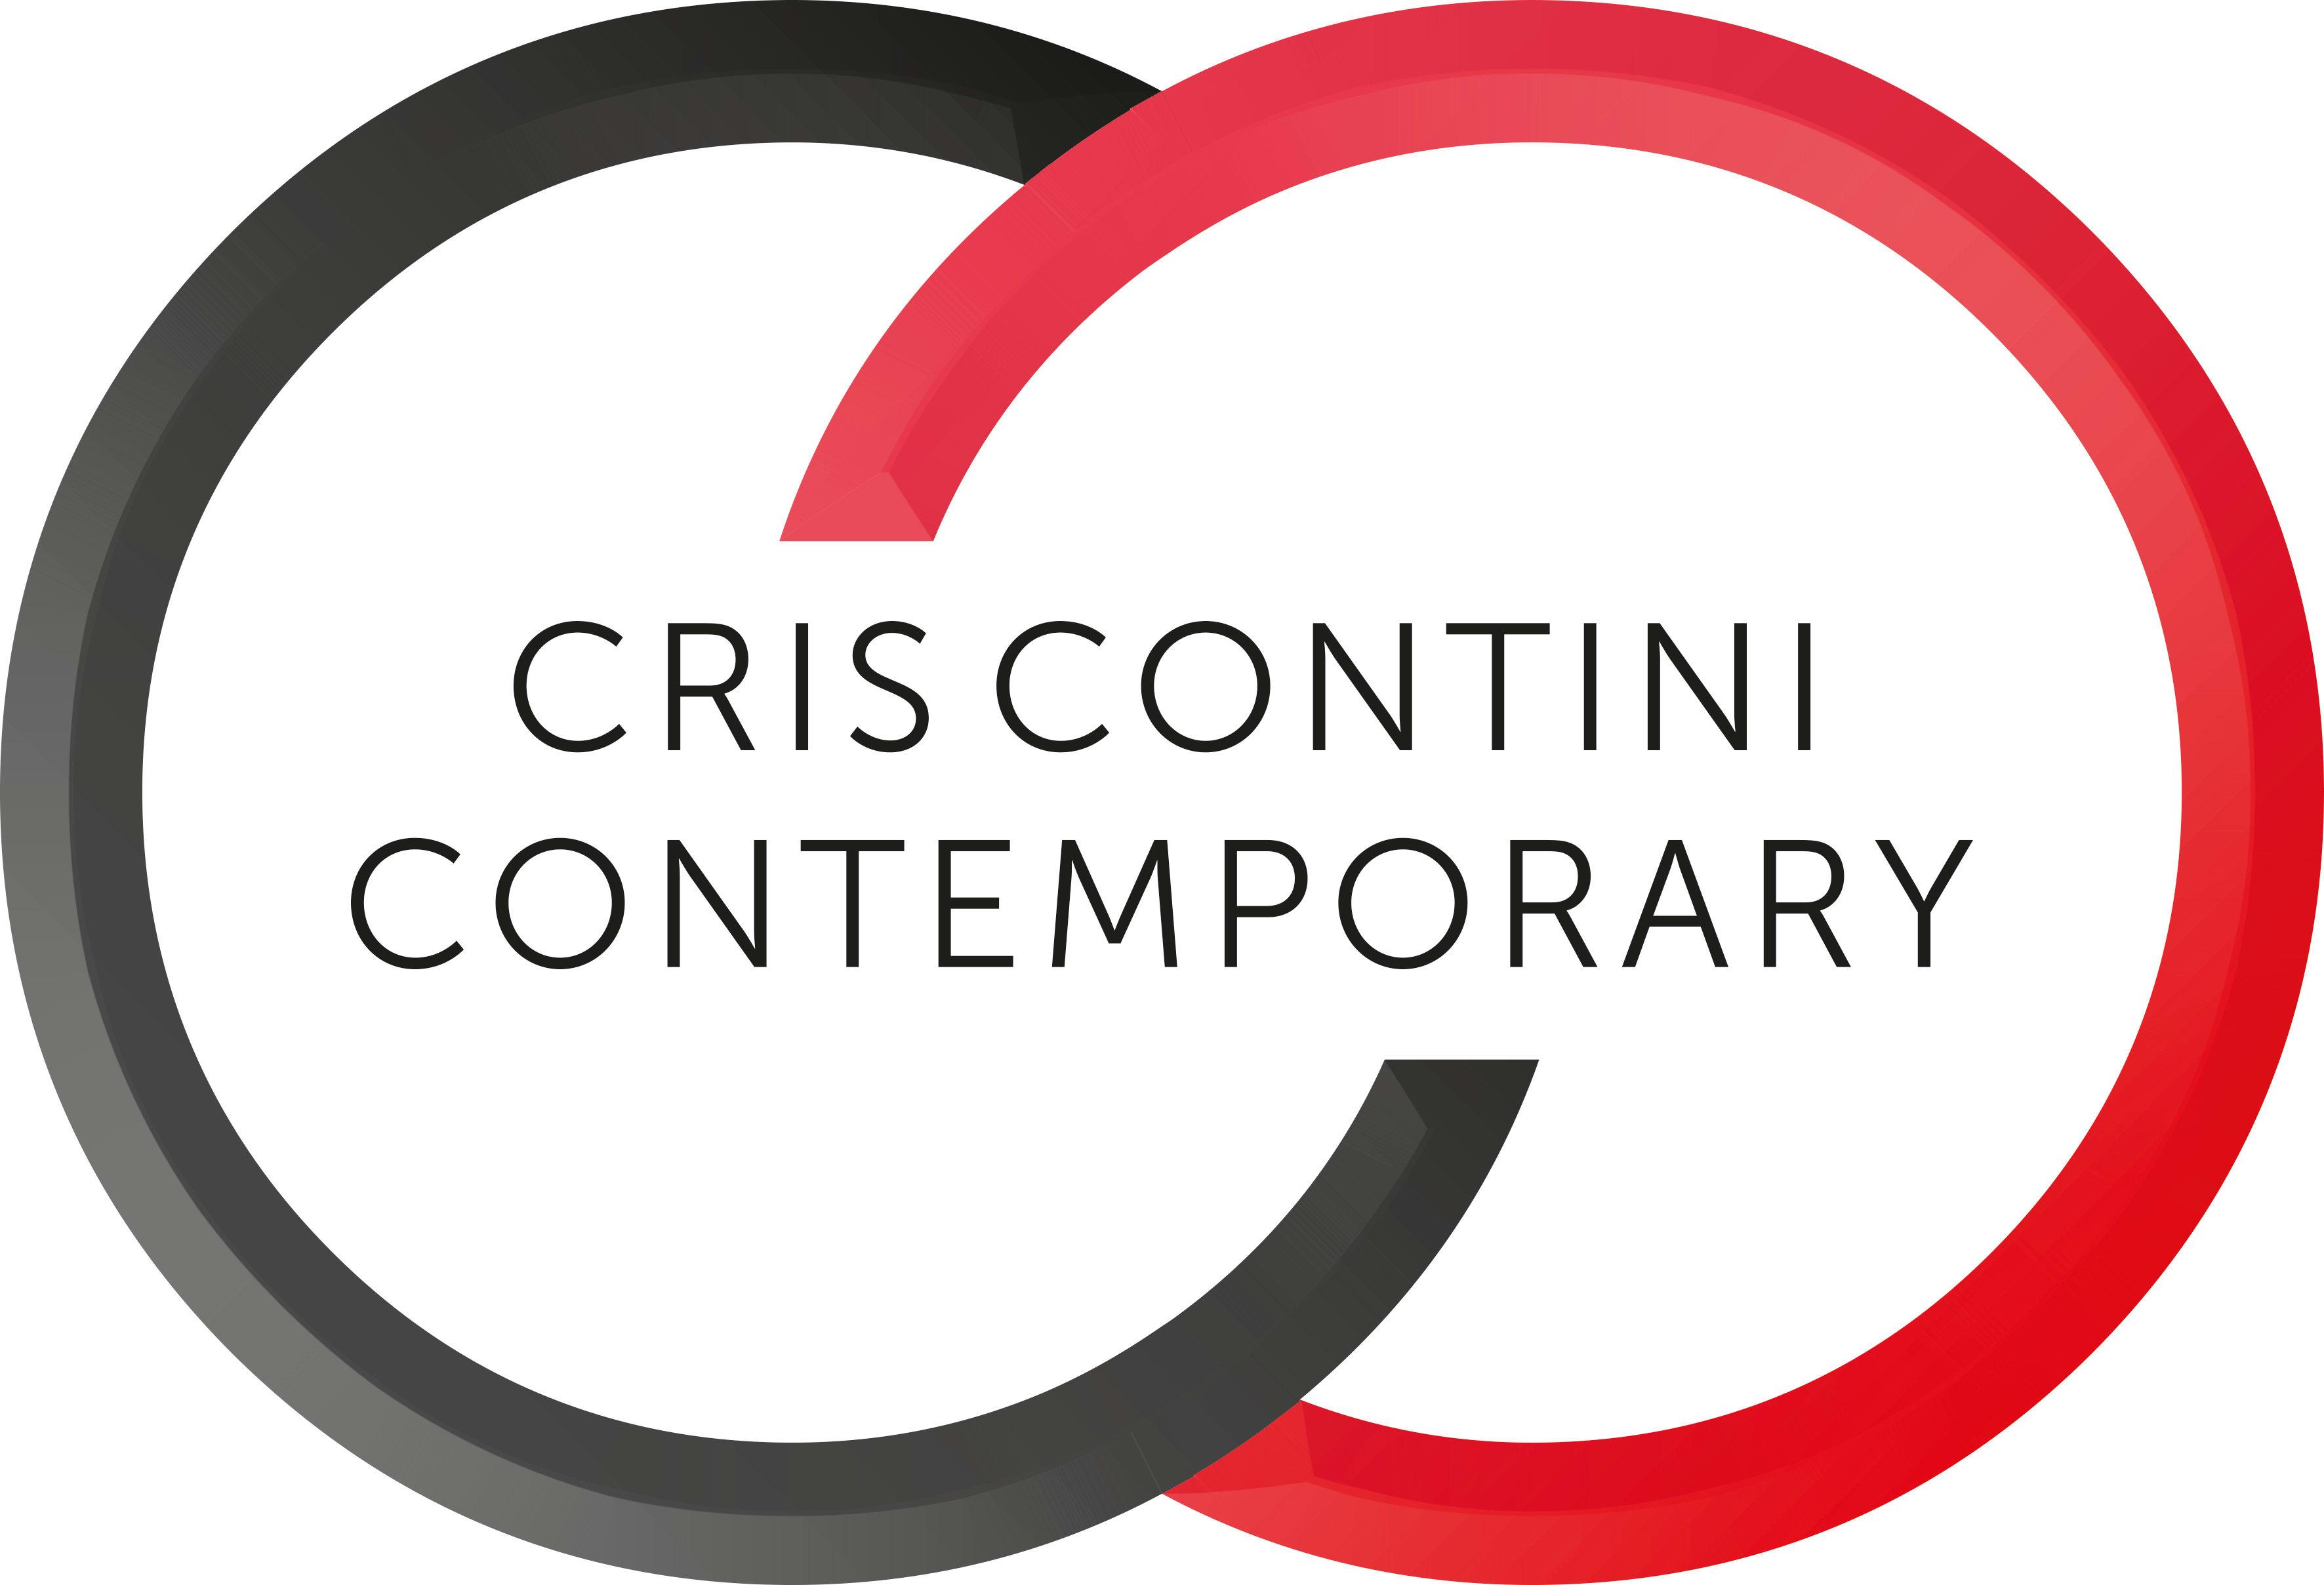 Cris Contini Contemporary company logo